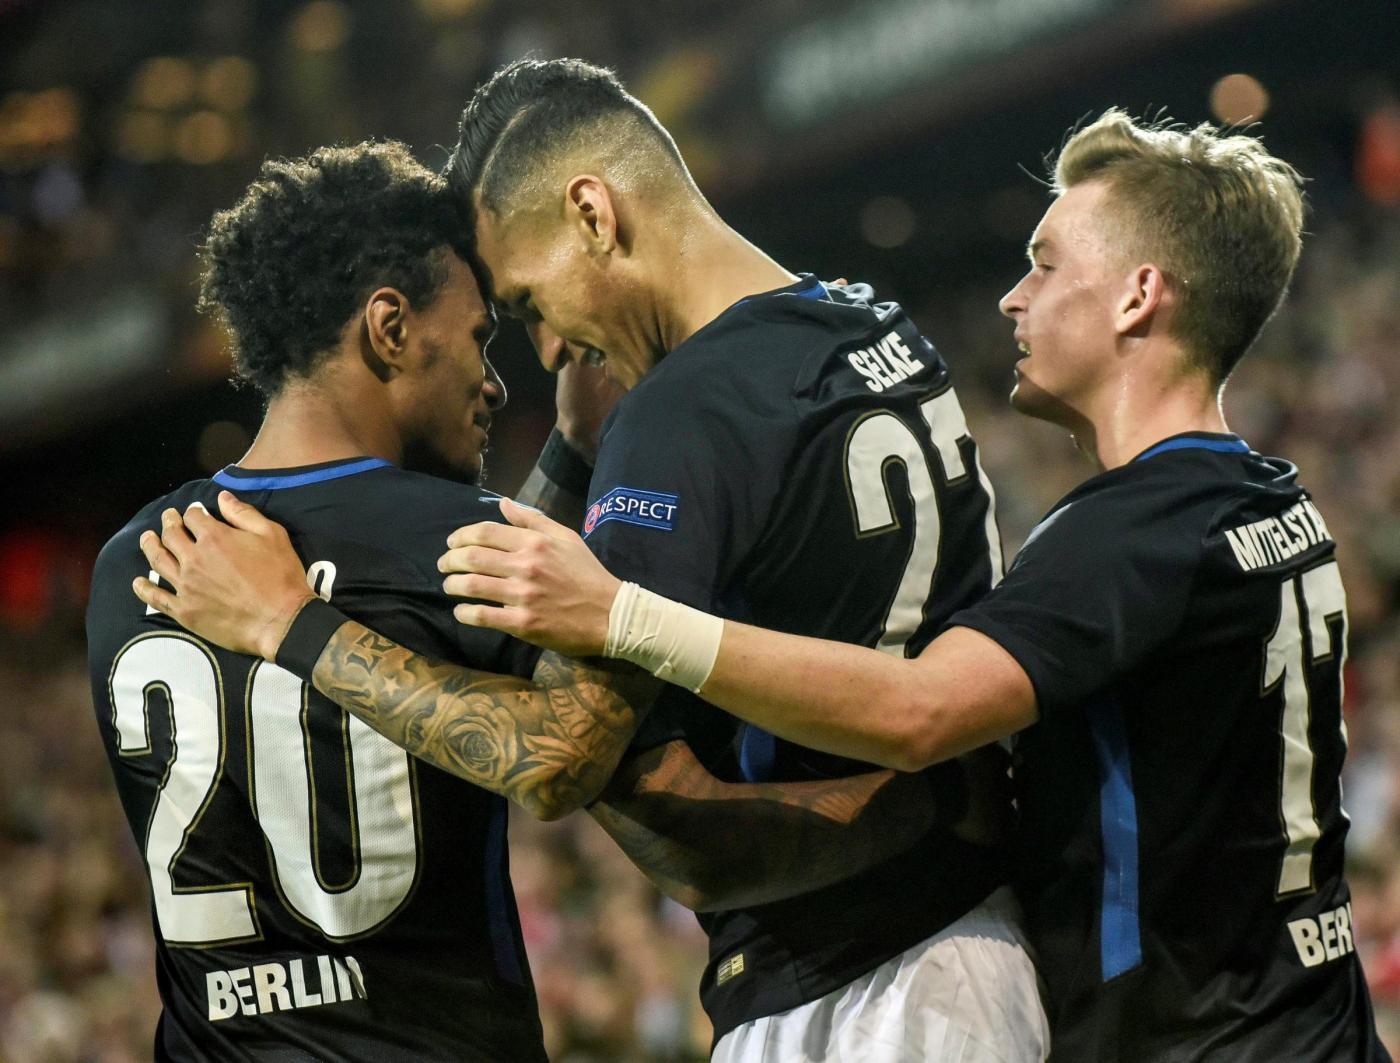 Bundesliga, Hertha-Friburgo pronostico: locali senza vittorie da sette turni